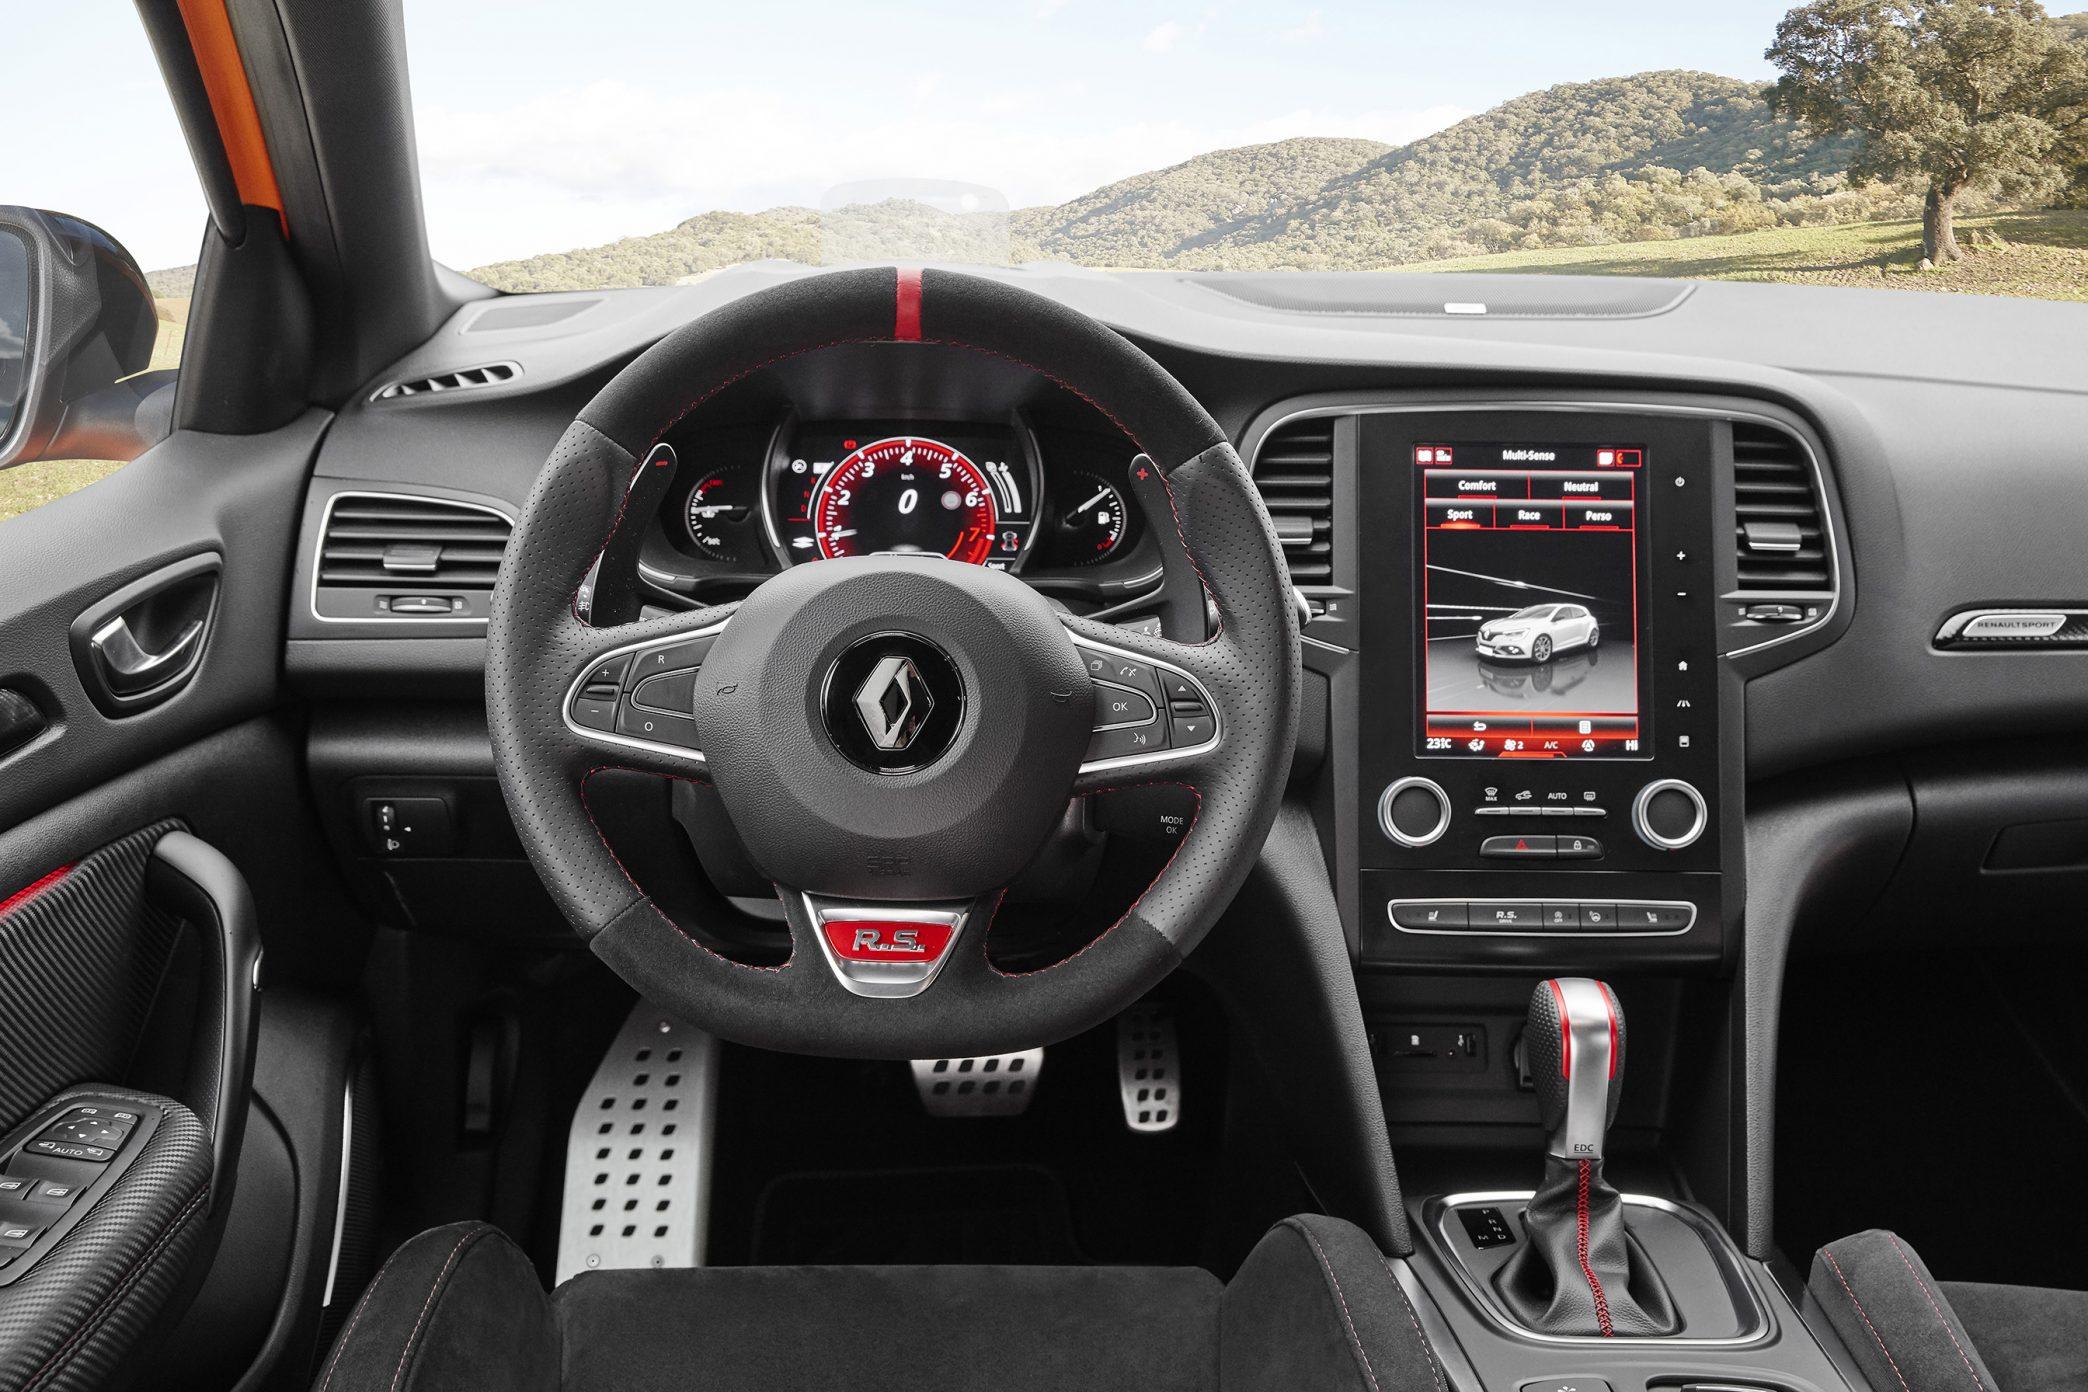 Renault Mégane RS — interior